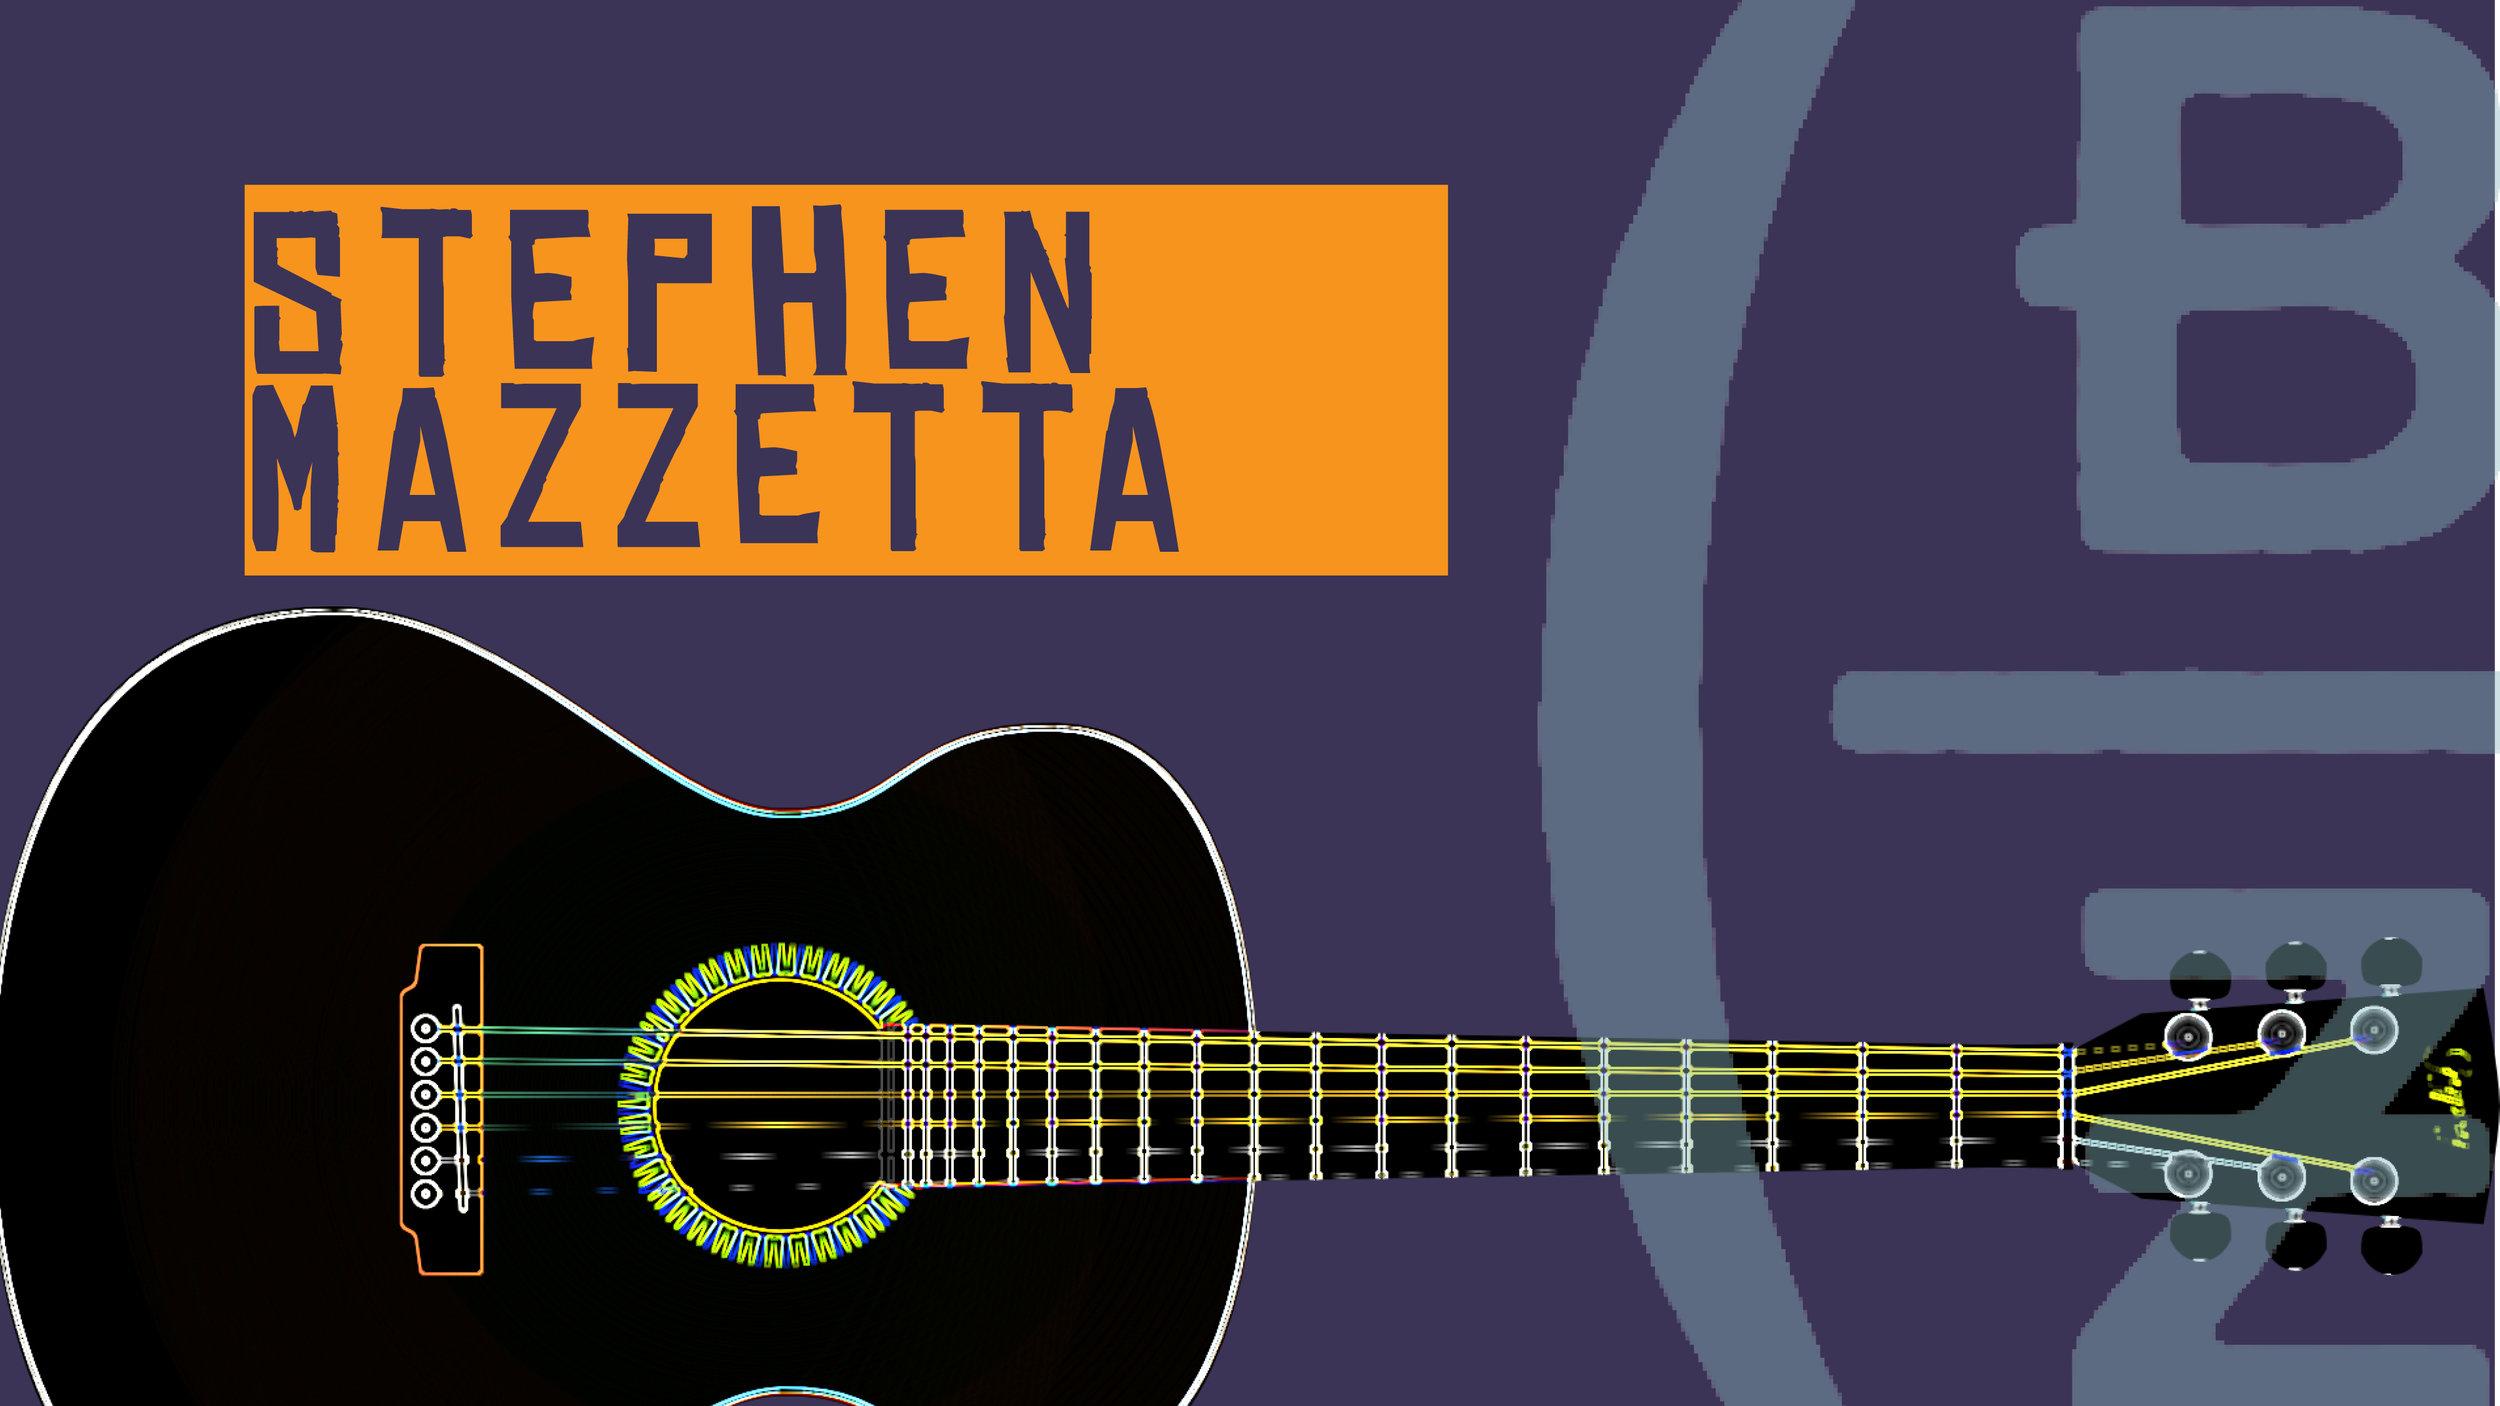 Stephen Mazzetta.jpg